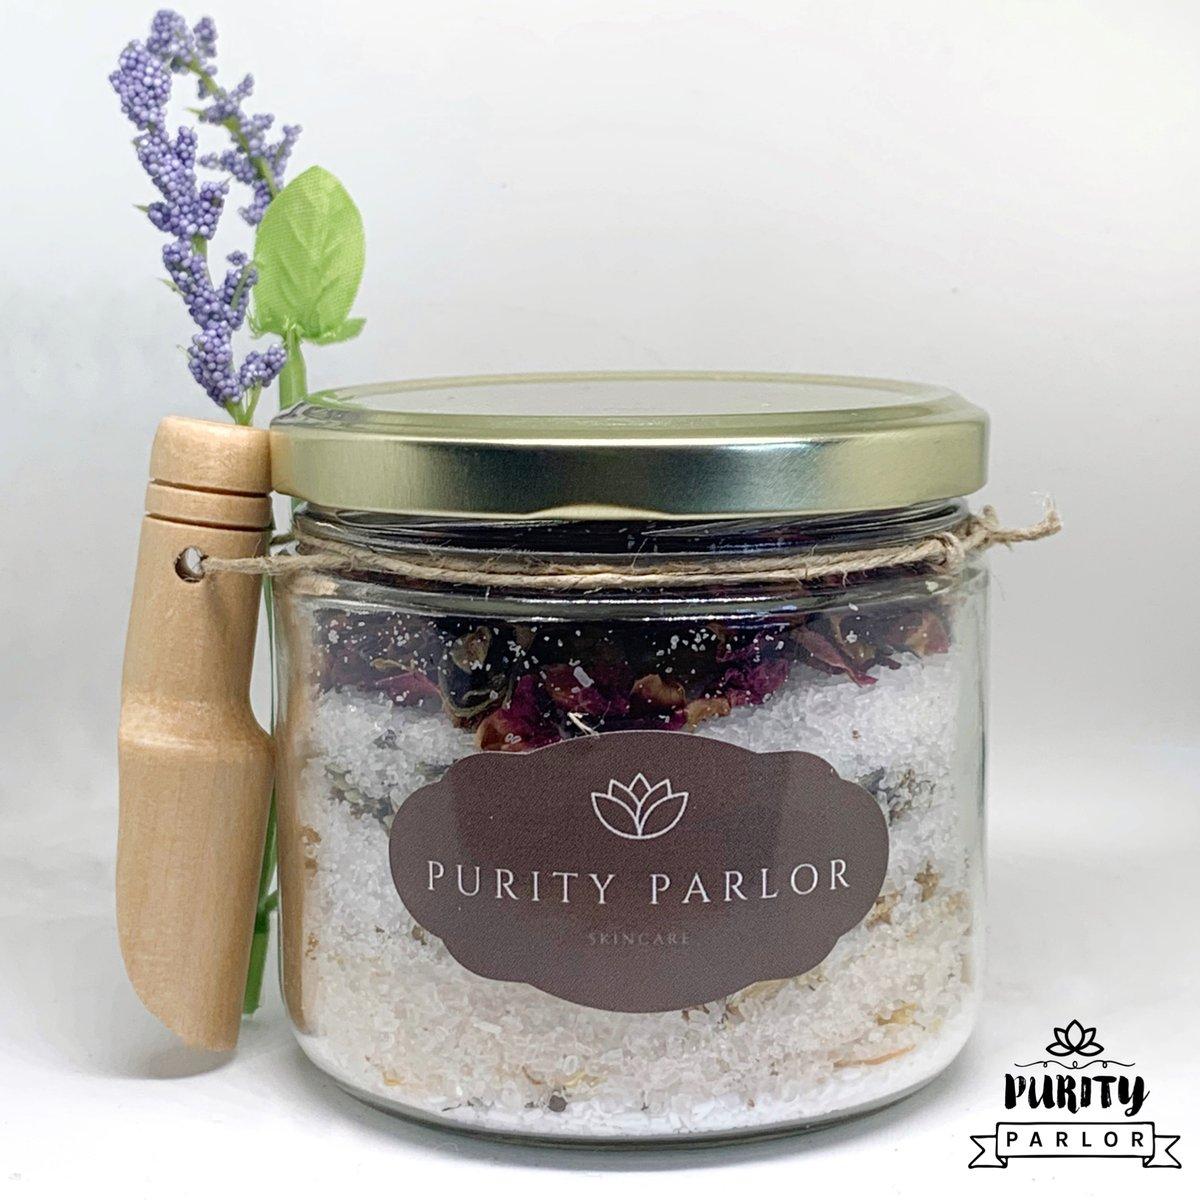 Floral Salt Treatment: Scent Lavender and Chamomile